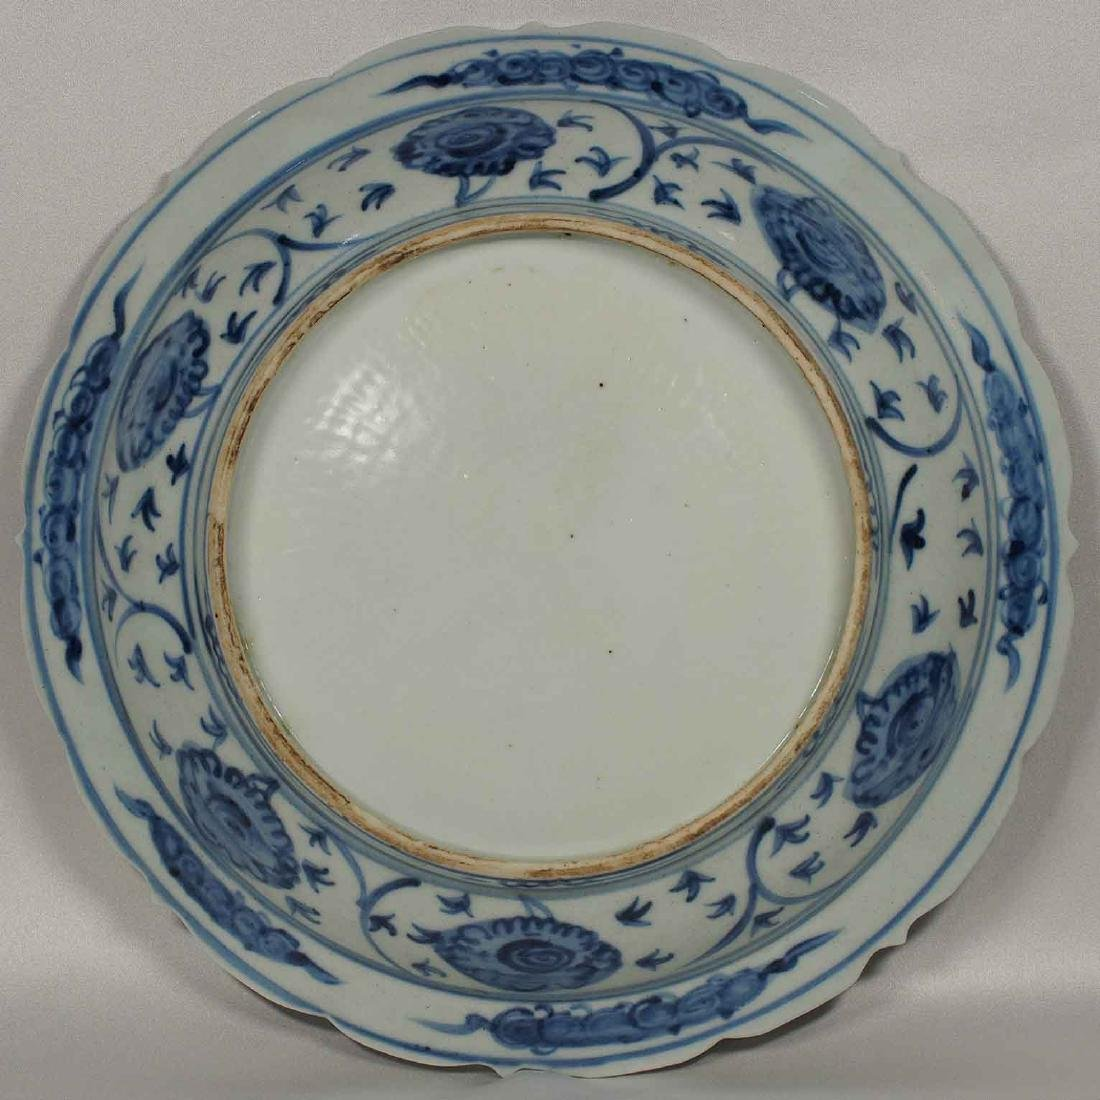 Plate with Qilin Design, Hongzhi-Zhengde, Ming Dynasty - 4